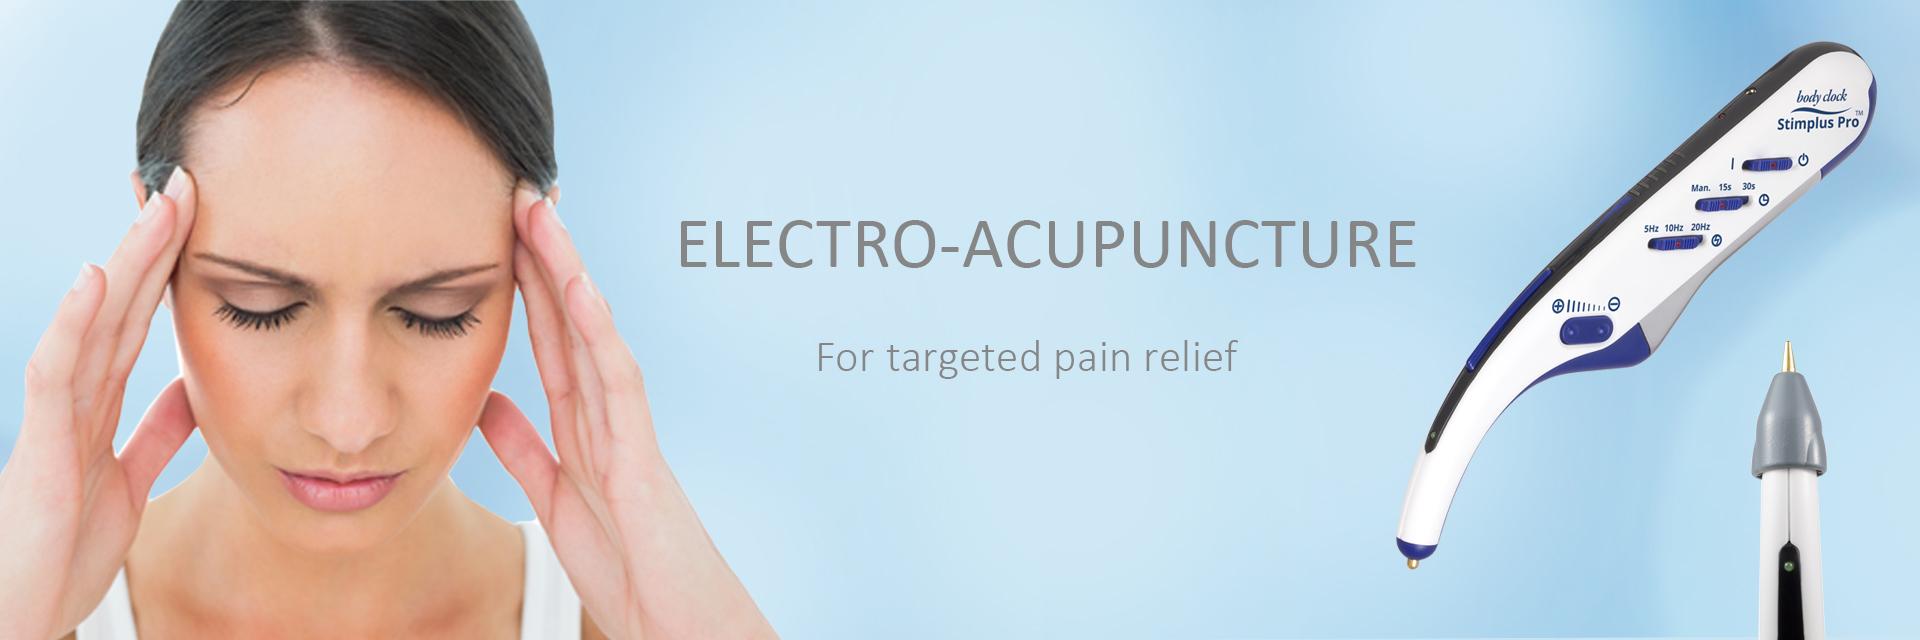 electro-acupuncture.jpg